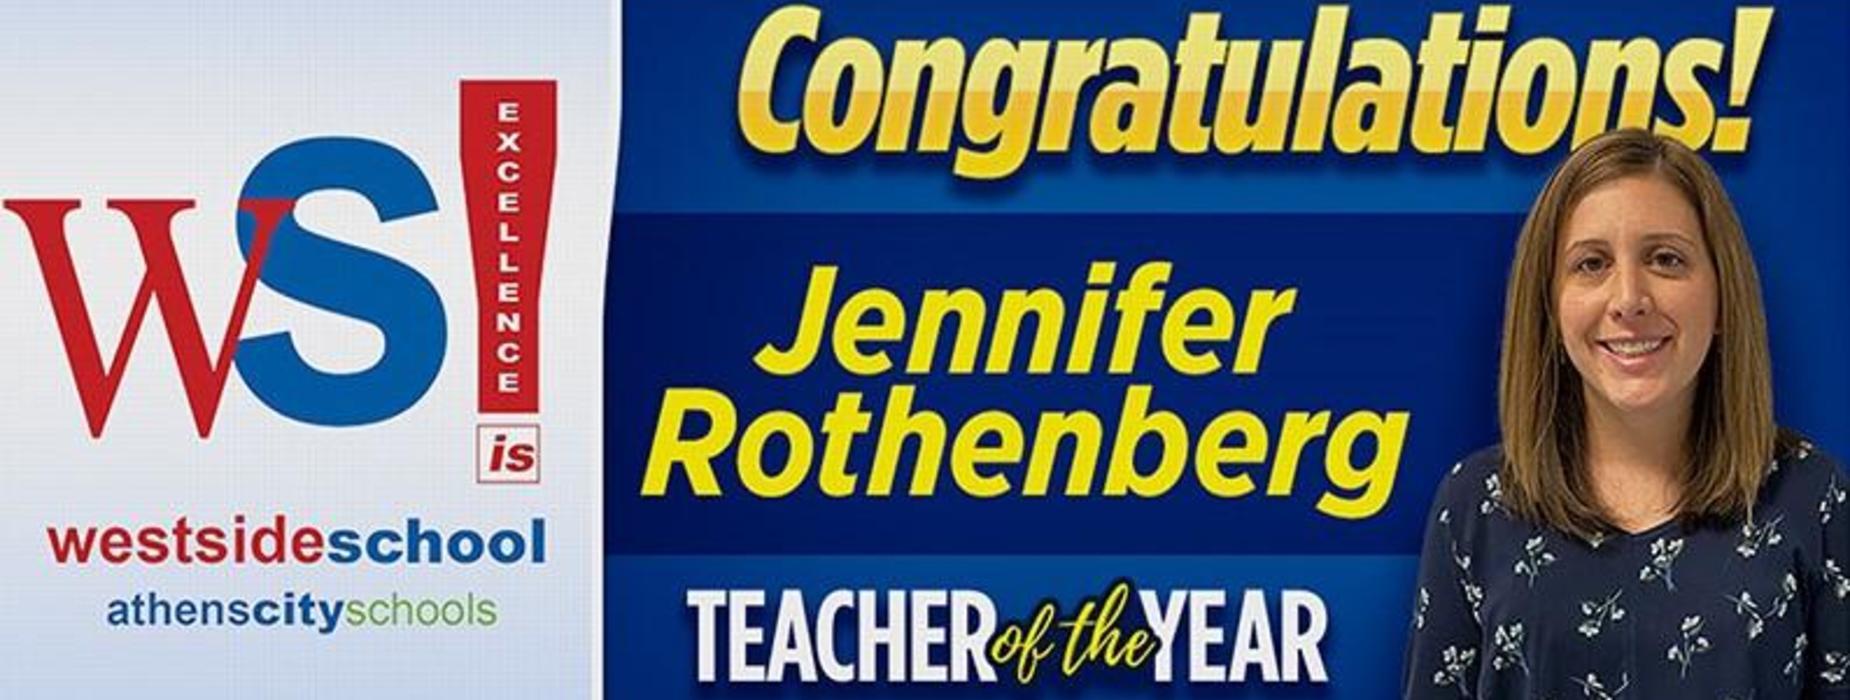 ws teacher of year